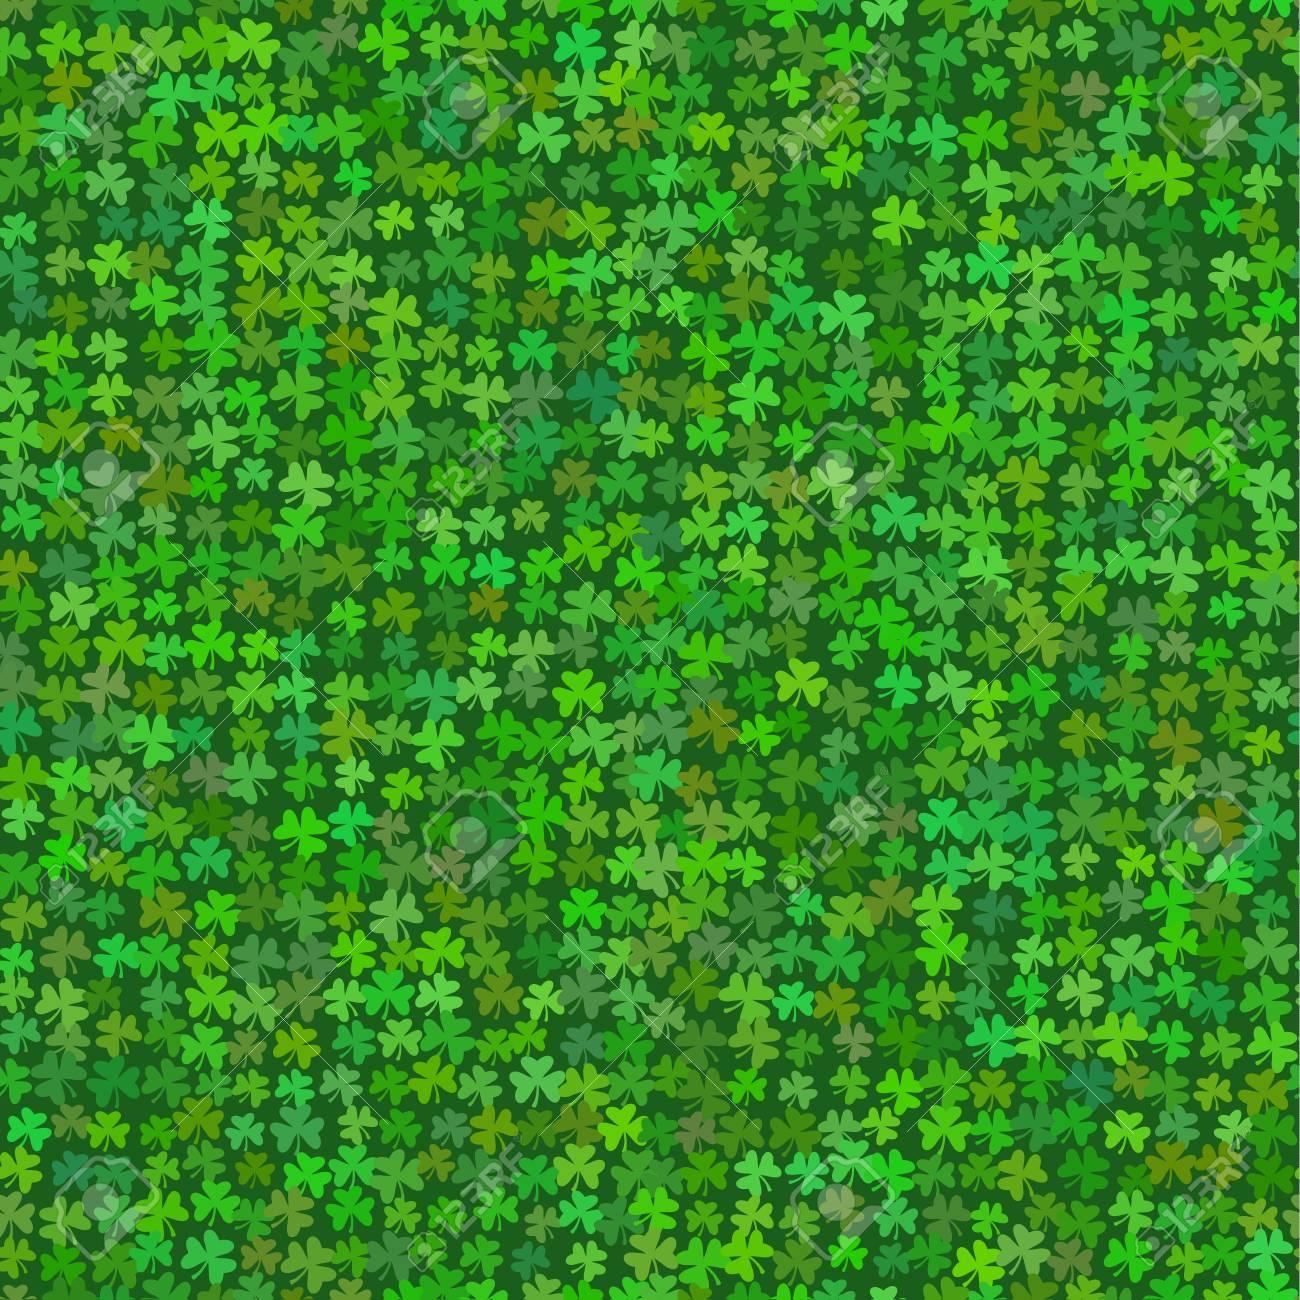 St Patricks Day Backgrounds Green Shamrock Seamless Patterns 1300x1300